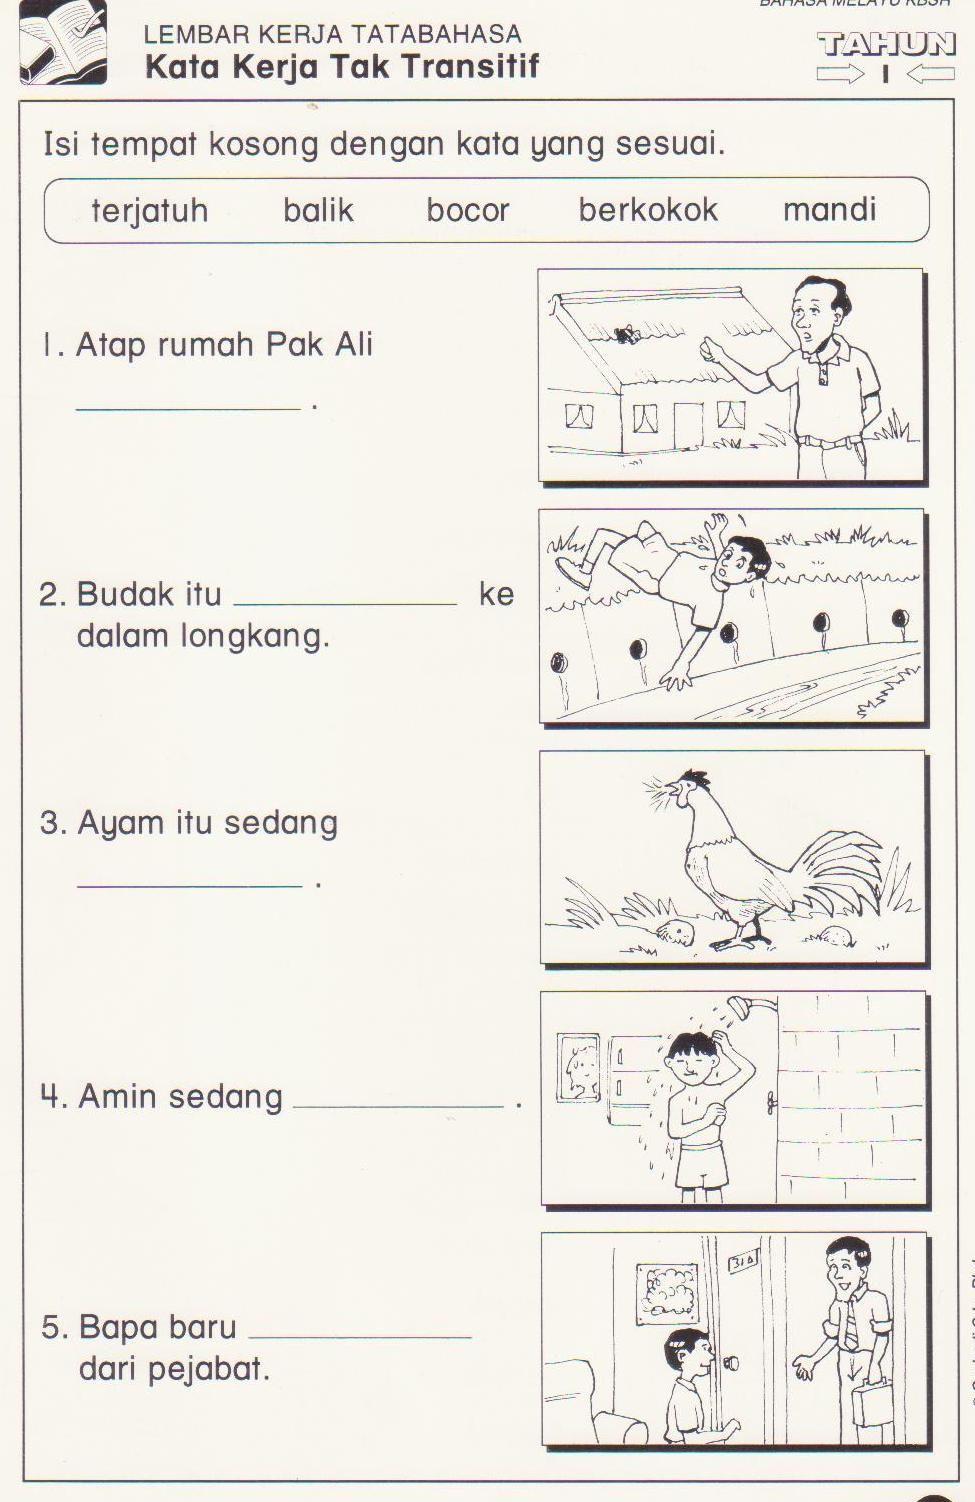 Latihan Kata Kerja Tak Transitif 1 Jpg 975 1502 School Kids Activities Preschool Learning Activities Elementry School